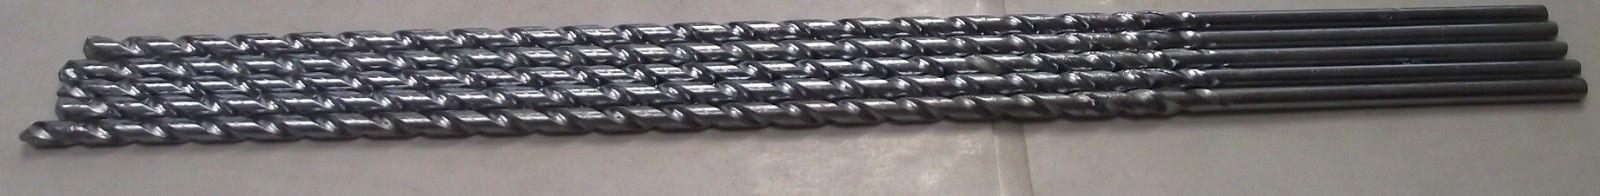 "Bosch 2608682860 6.5mm 1/4"" x 400mm 15-3/4"" RSZ Masonry Drill Bits 5pcs. - $8.91"